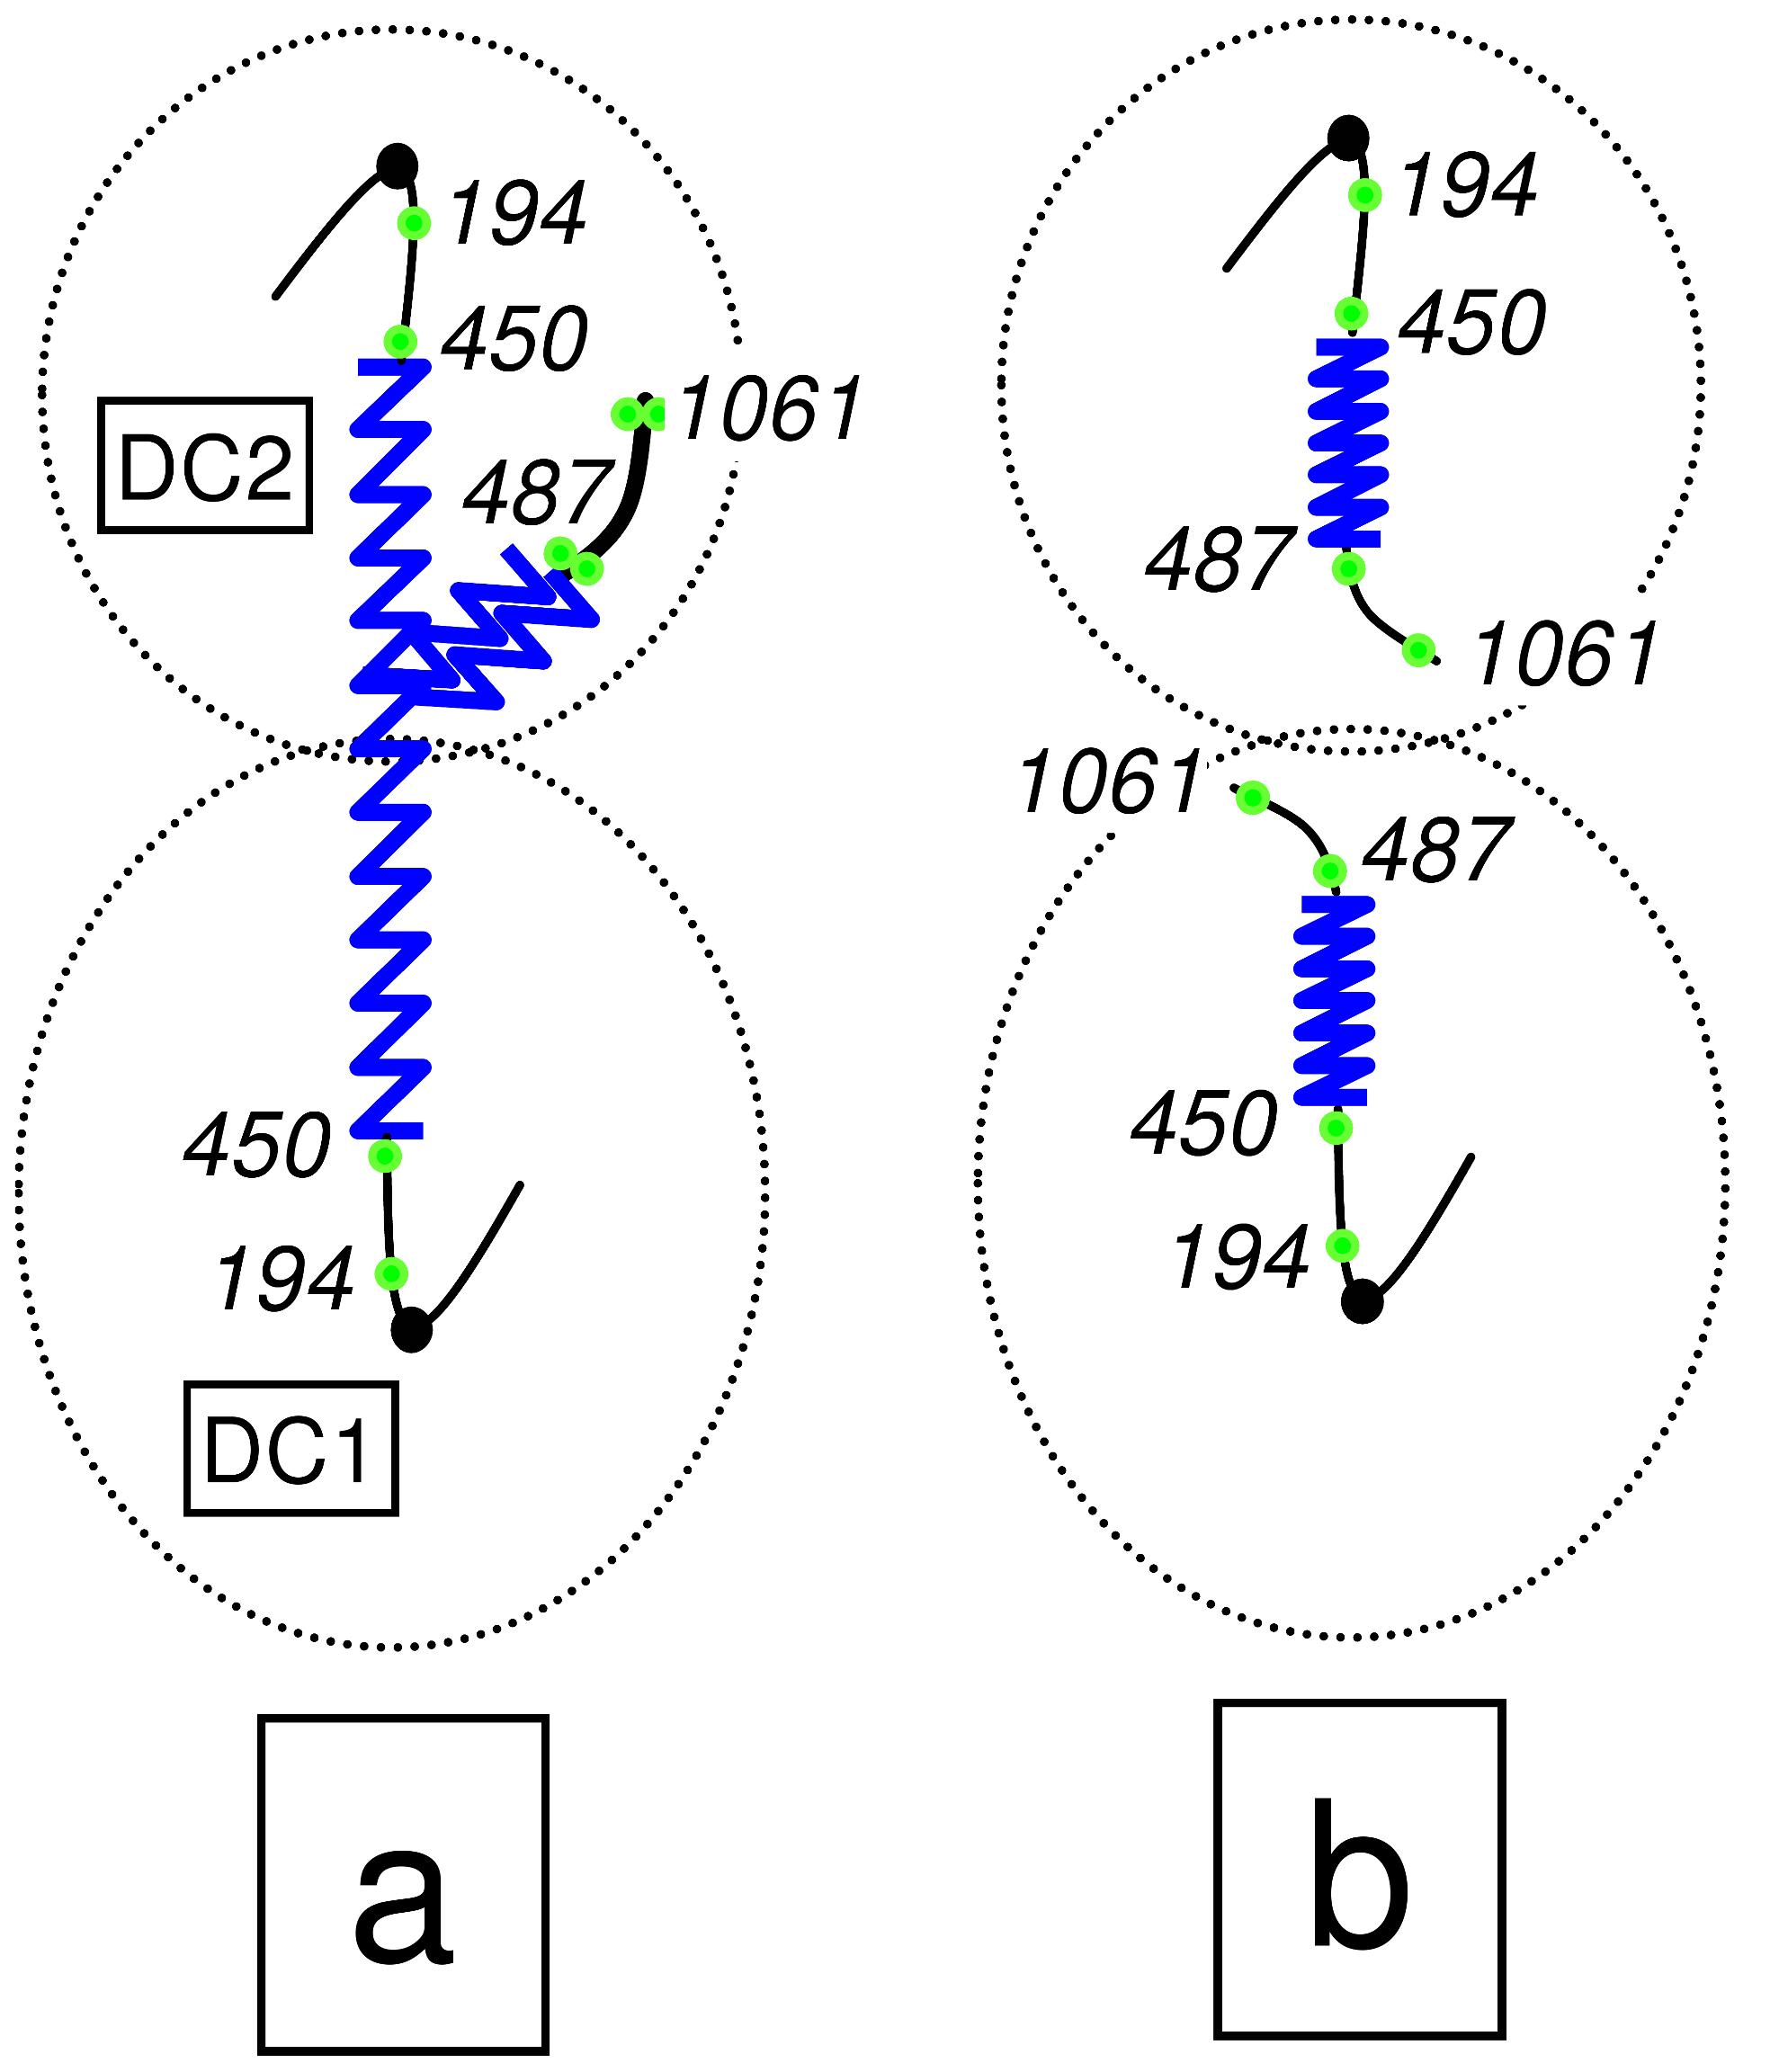 Scheme of the chromosome XII anaphase bridge (cXIIr) in a <i>cdc14-1</i> telophase block.